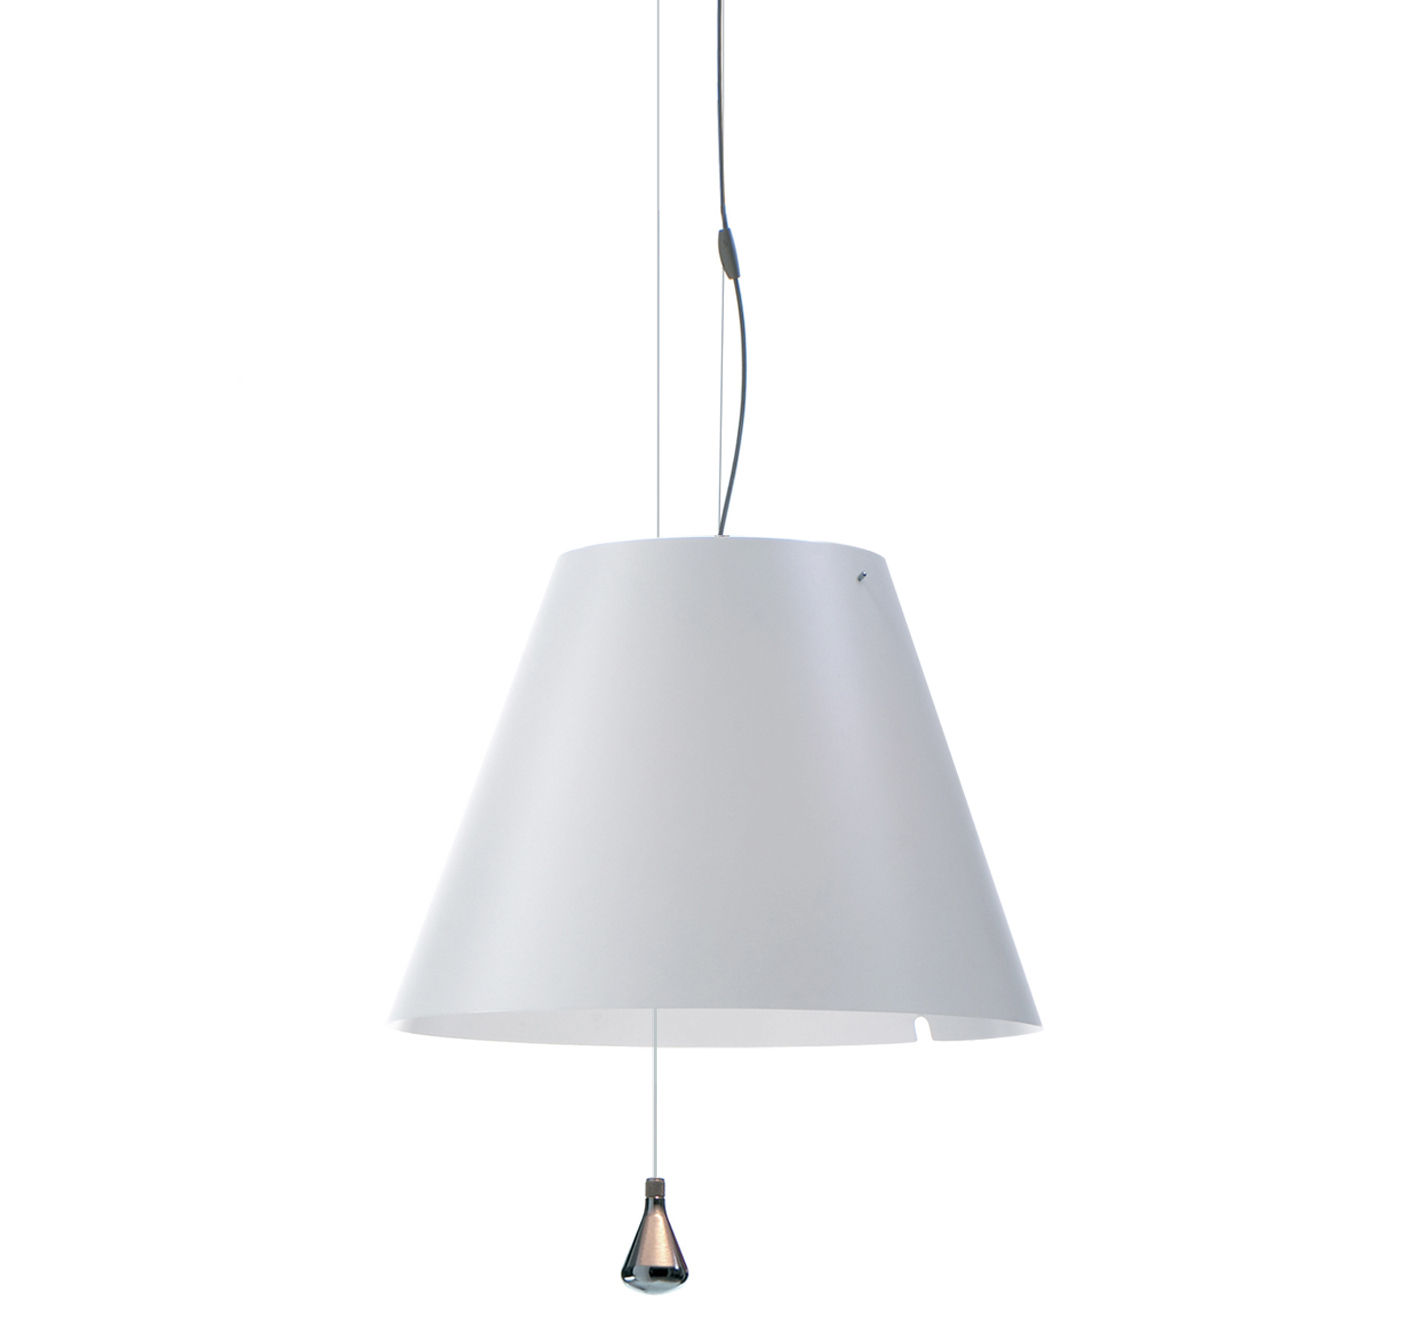 Illuminazione - Lampadari - Sospensione Lady Costanza - / Ø 50 cm x H 35 cm di Luceplan - Bianco - policarbonato